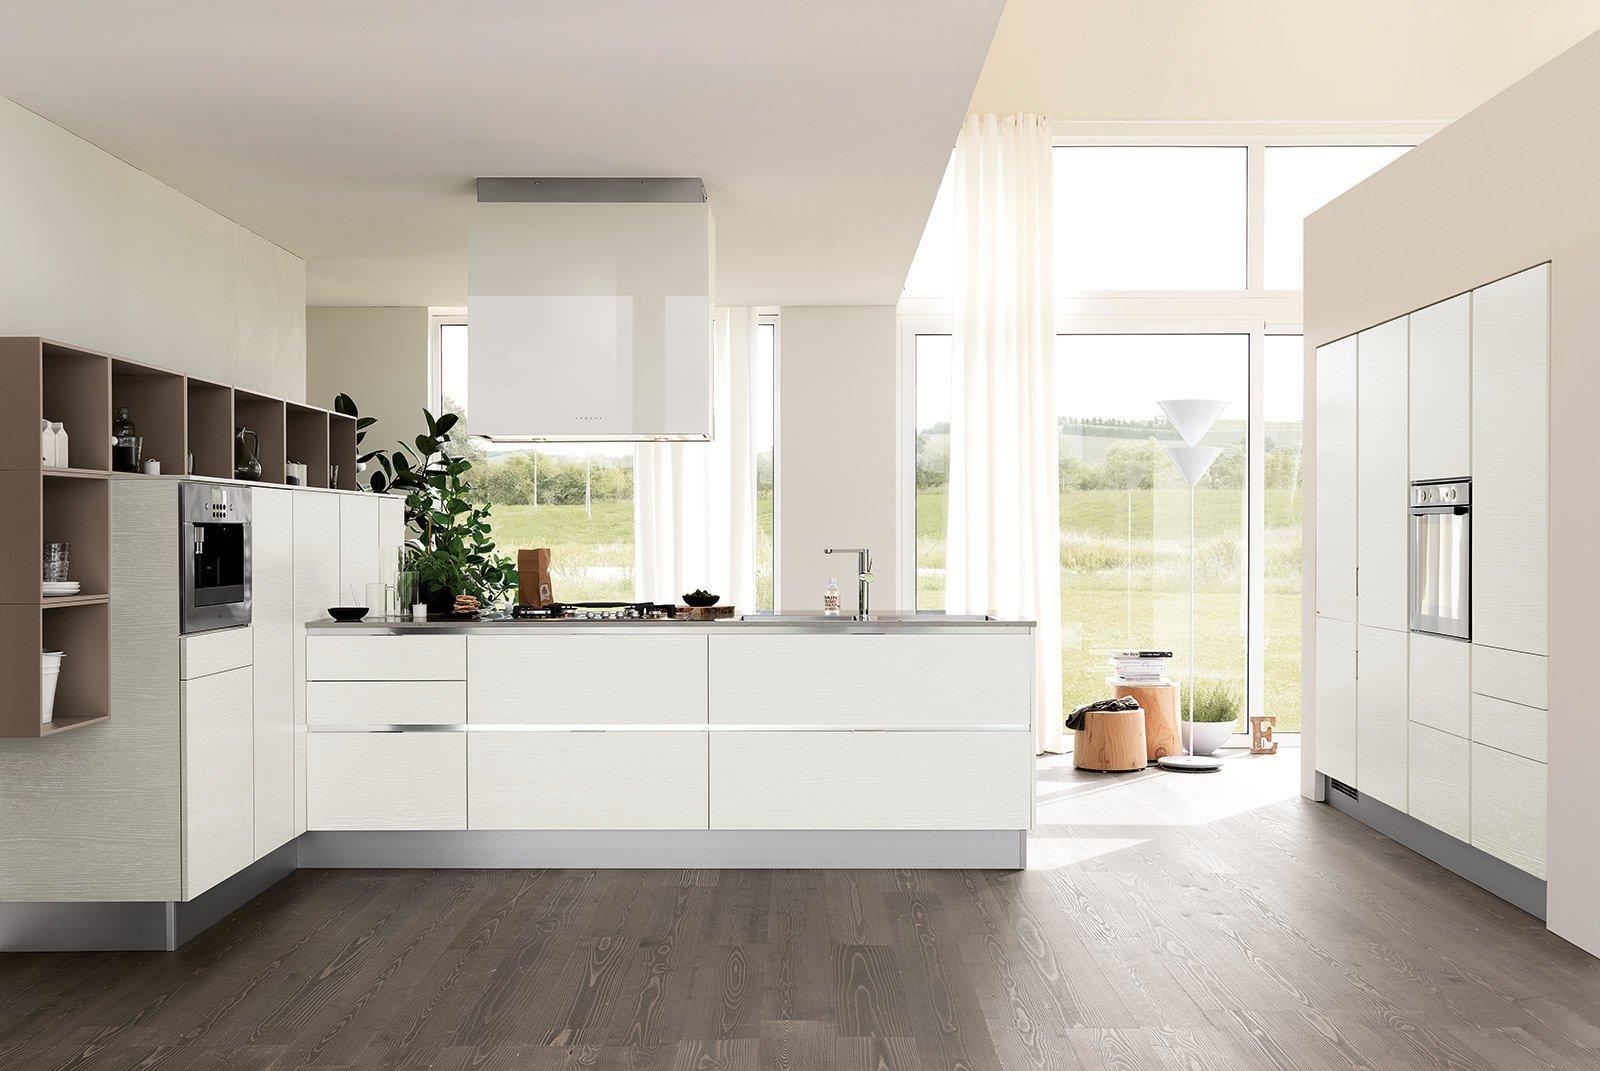 Cucine bianche moderne cose di casa for Case moderne sotto 100k